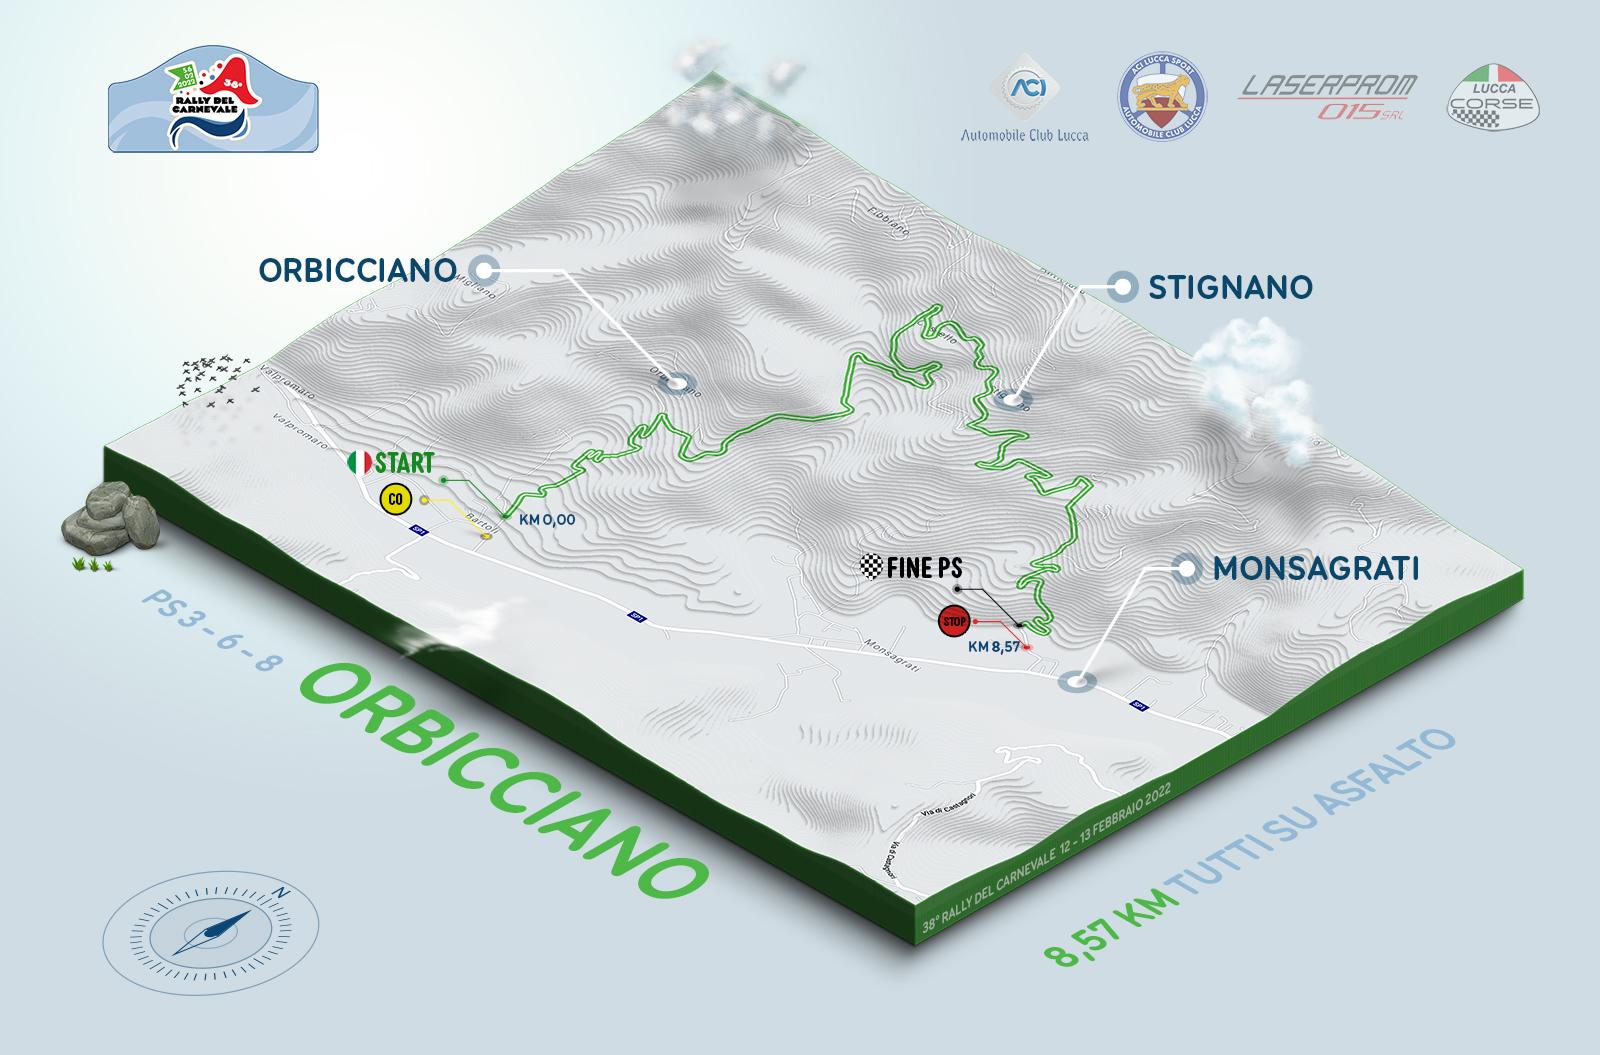 ps02-orbicciano